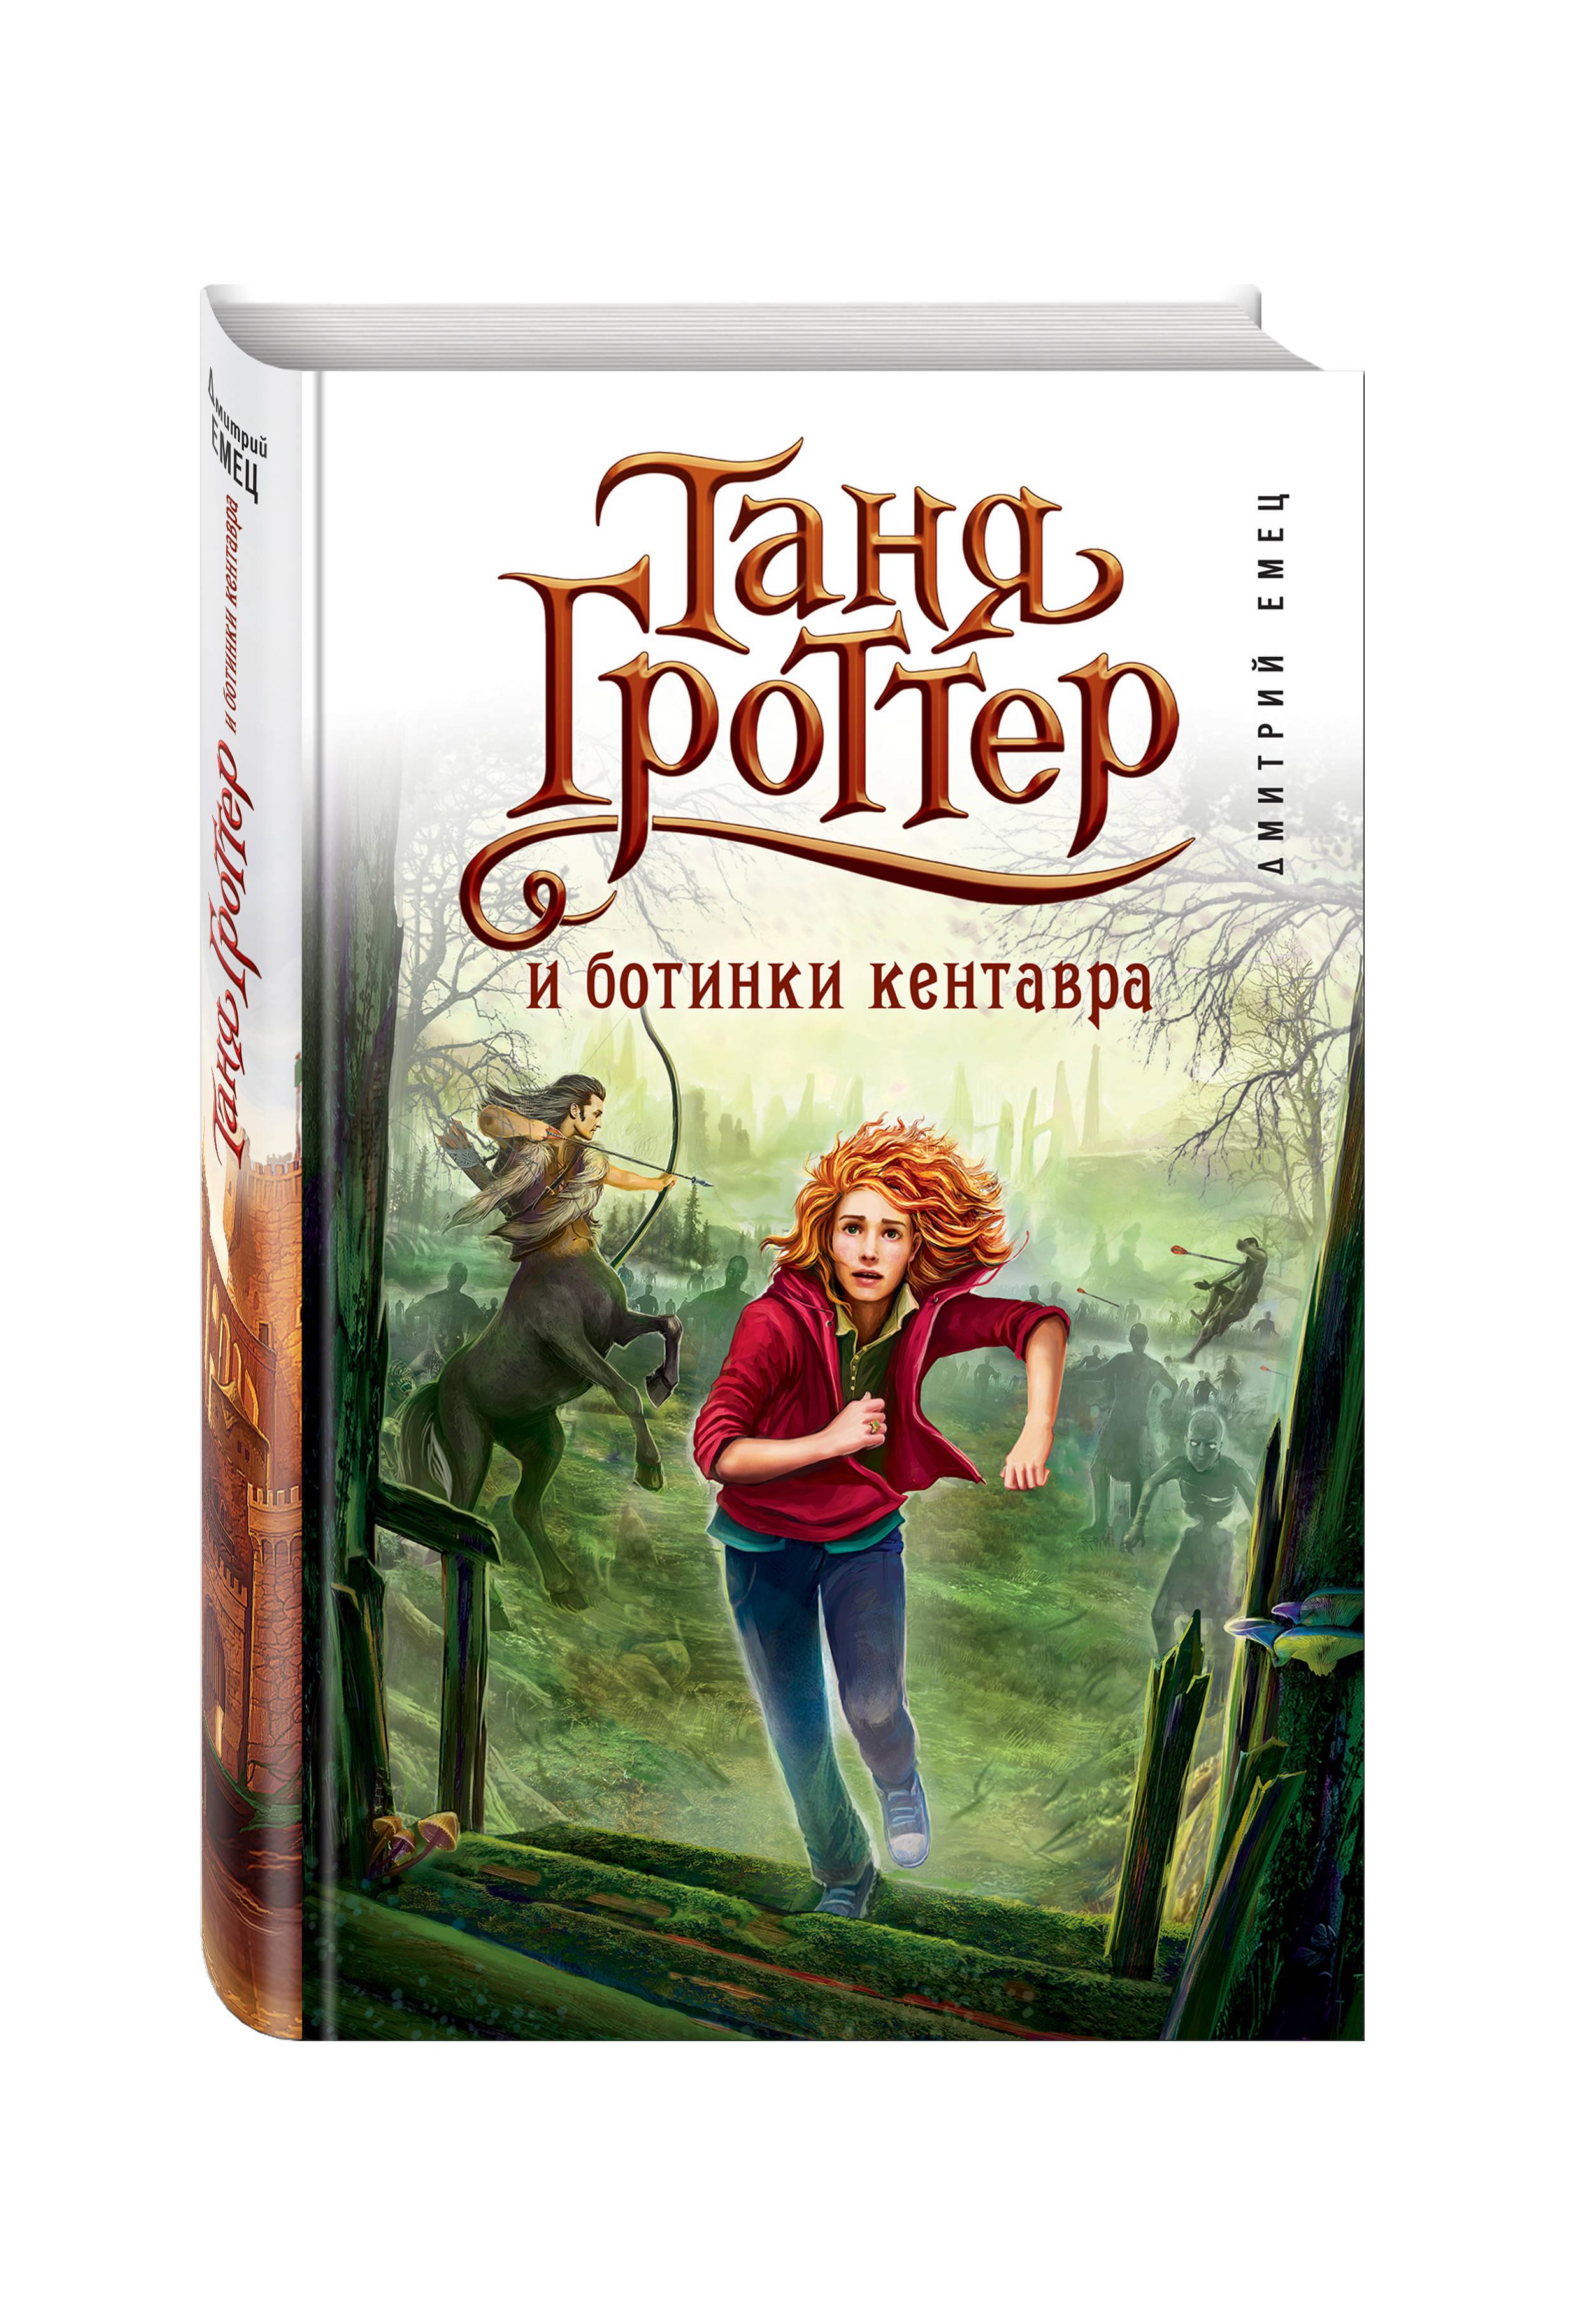 Емец Дмитрий Александрович Таня Гроттер и ботинки кентавра (#8) емец д таня гроттер и птица титанов